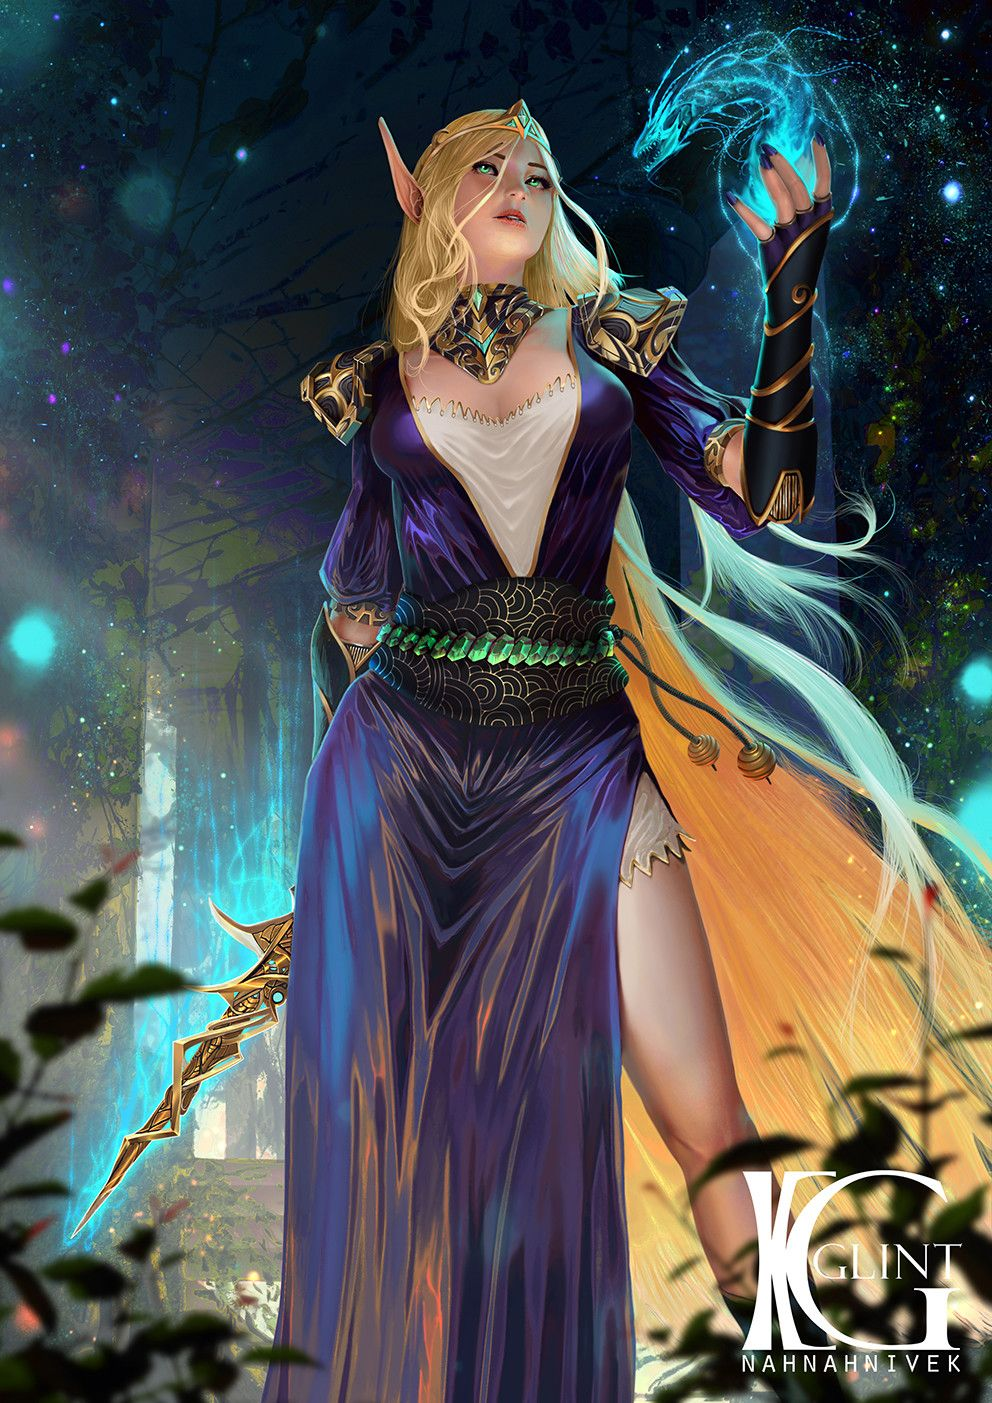 Blood Elf Sorcerer, Kevin Glint on ArtStation at https://www.artstation.com/artwork/XJZAY